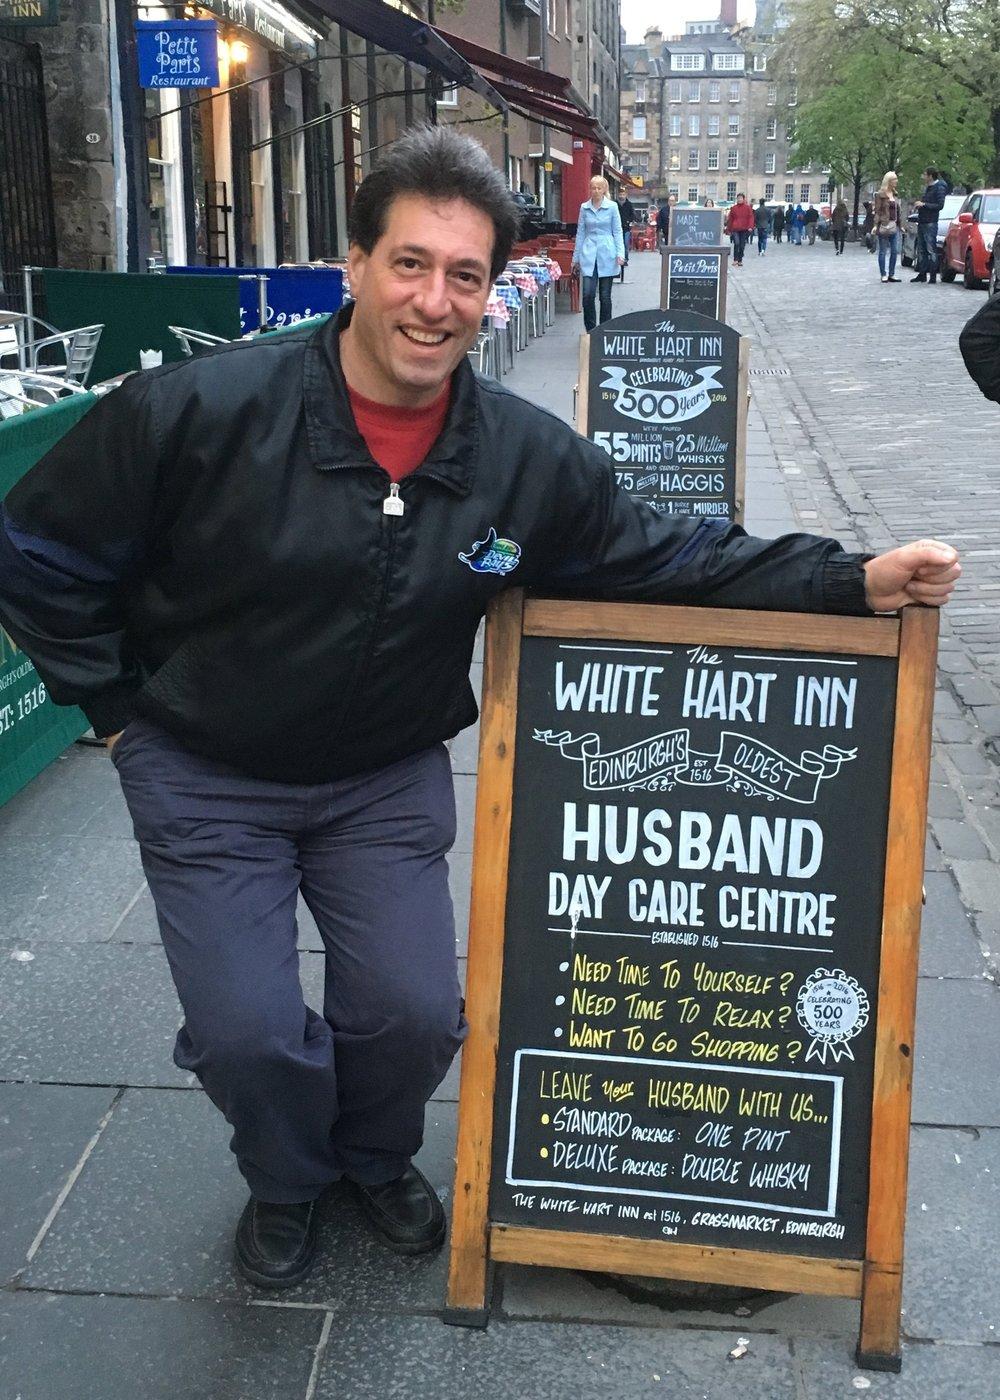 Husband Day Care in Grassmarket (Edinburgh) 2016